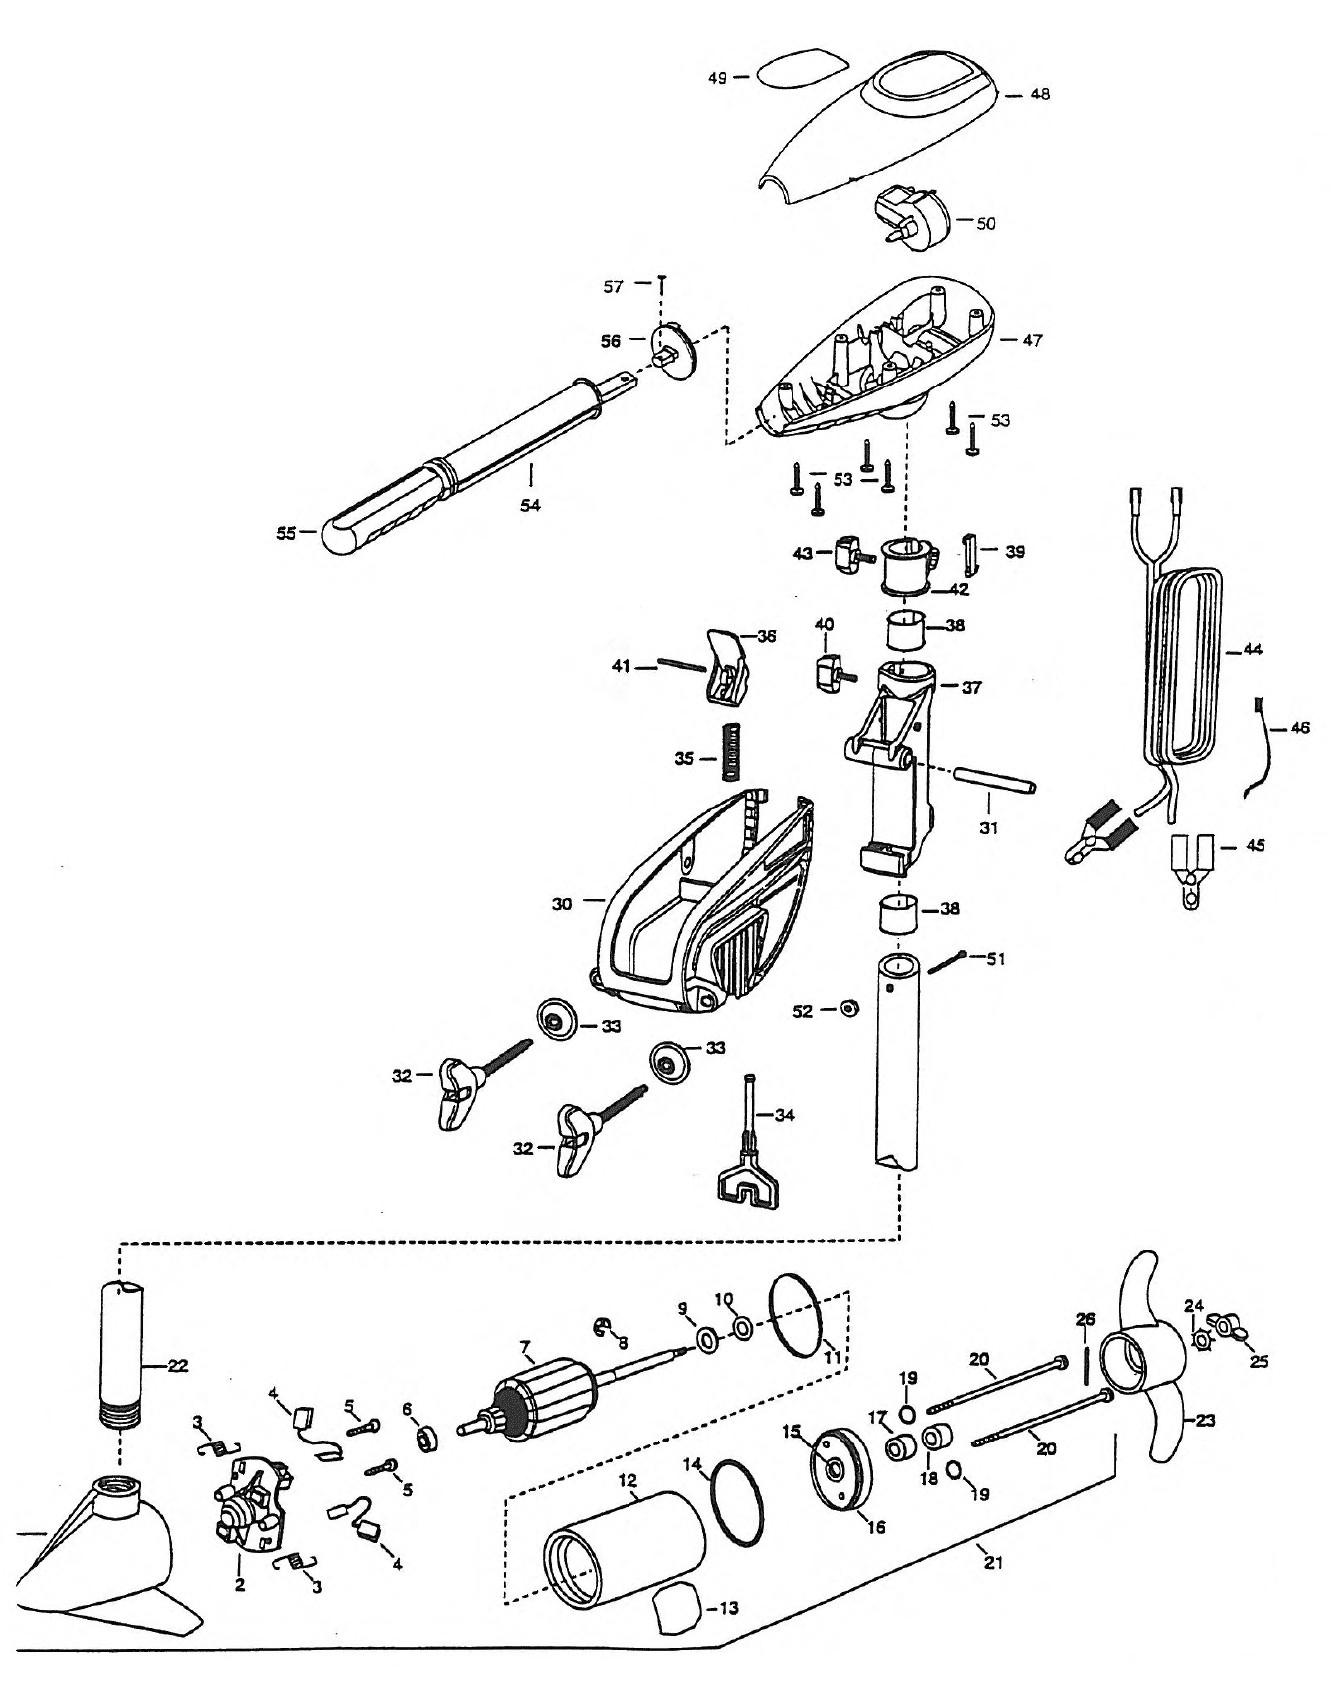 24 Volt Trolling Motor Receptacle